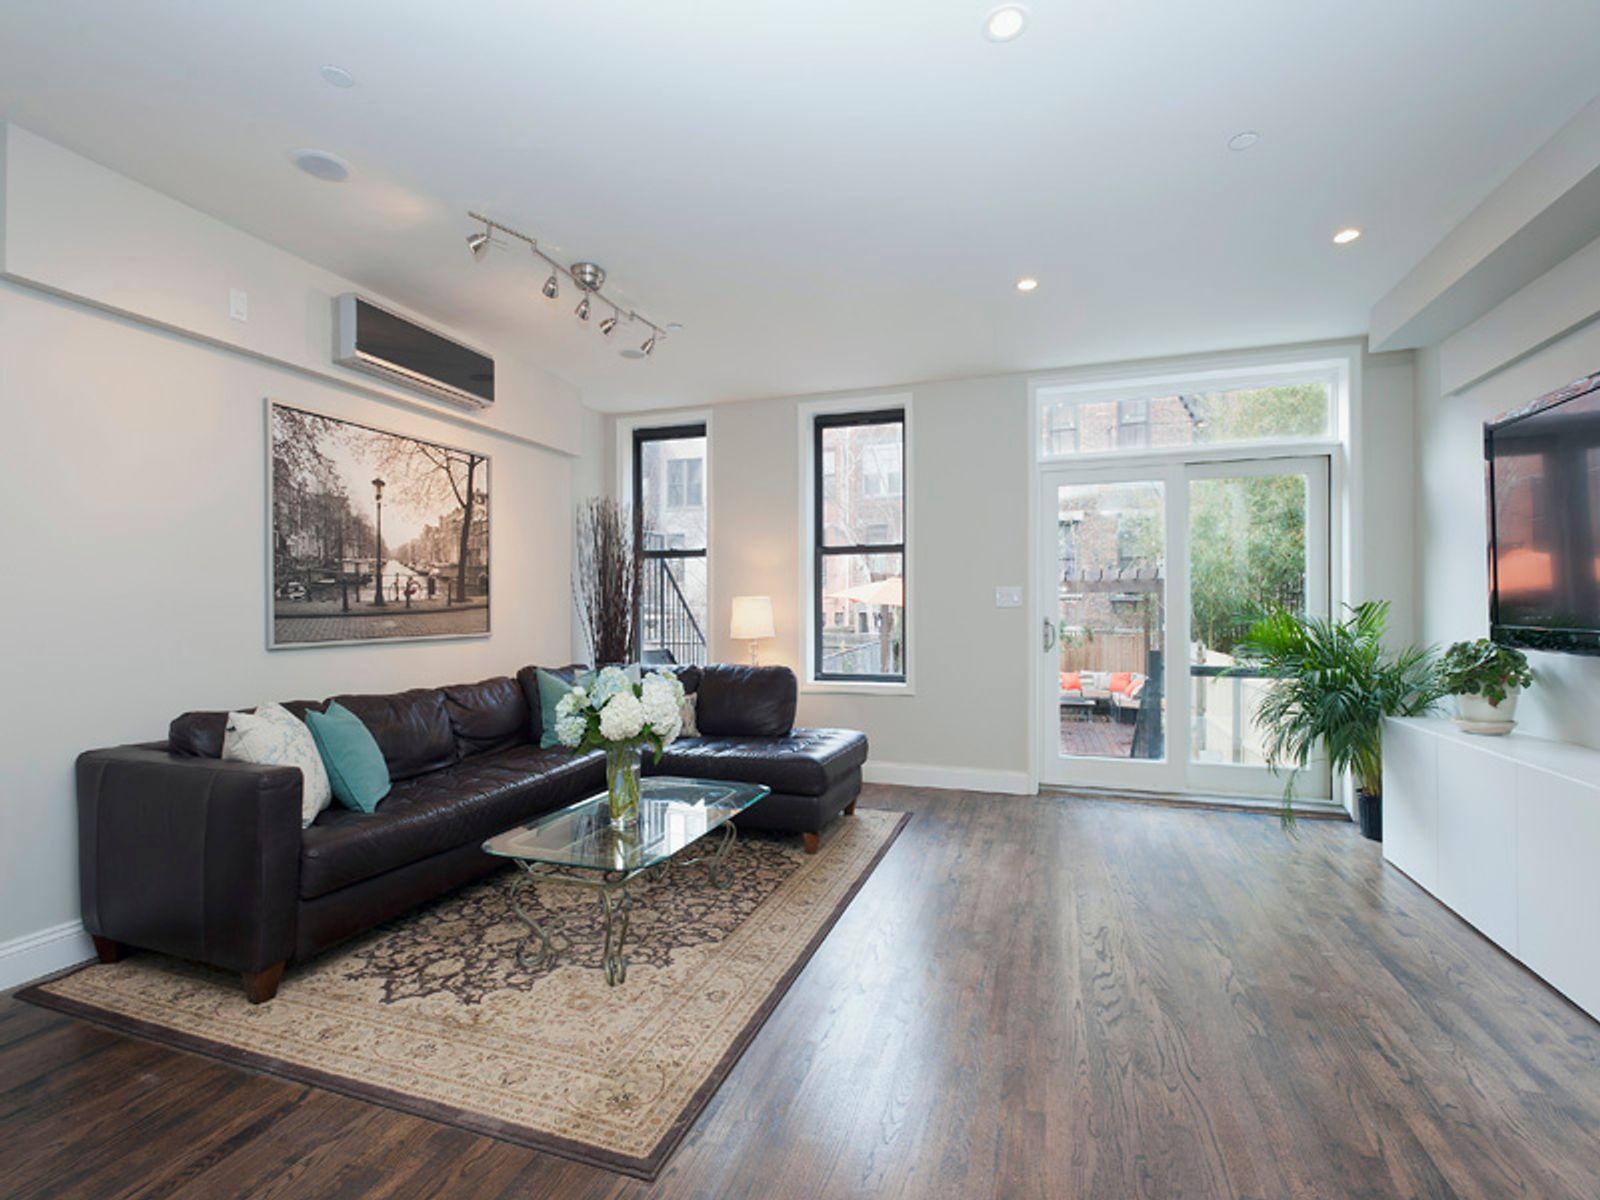 529 West 142nd Street